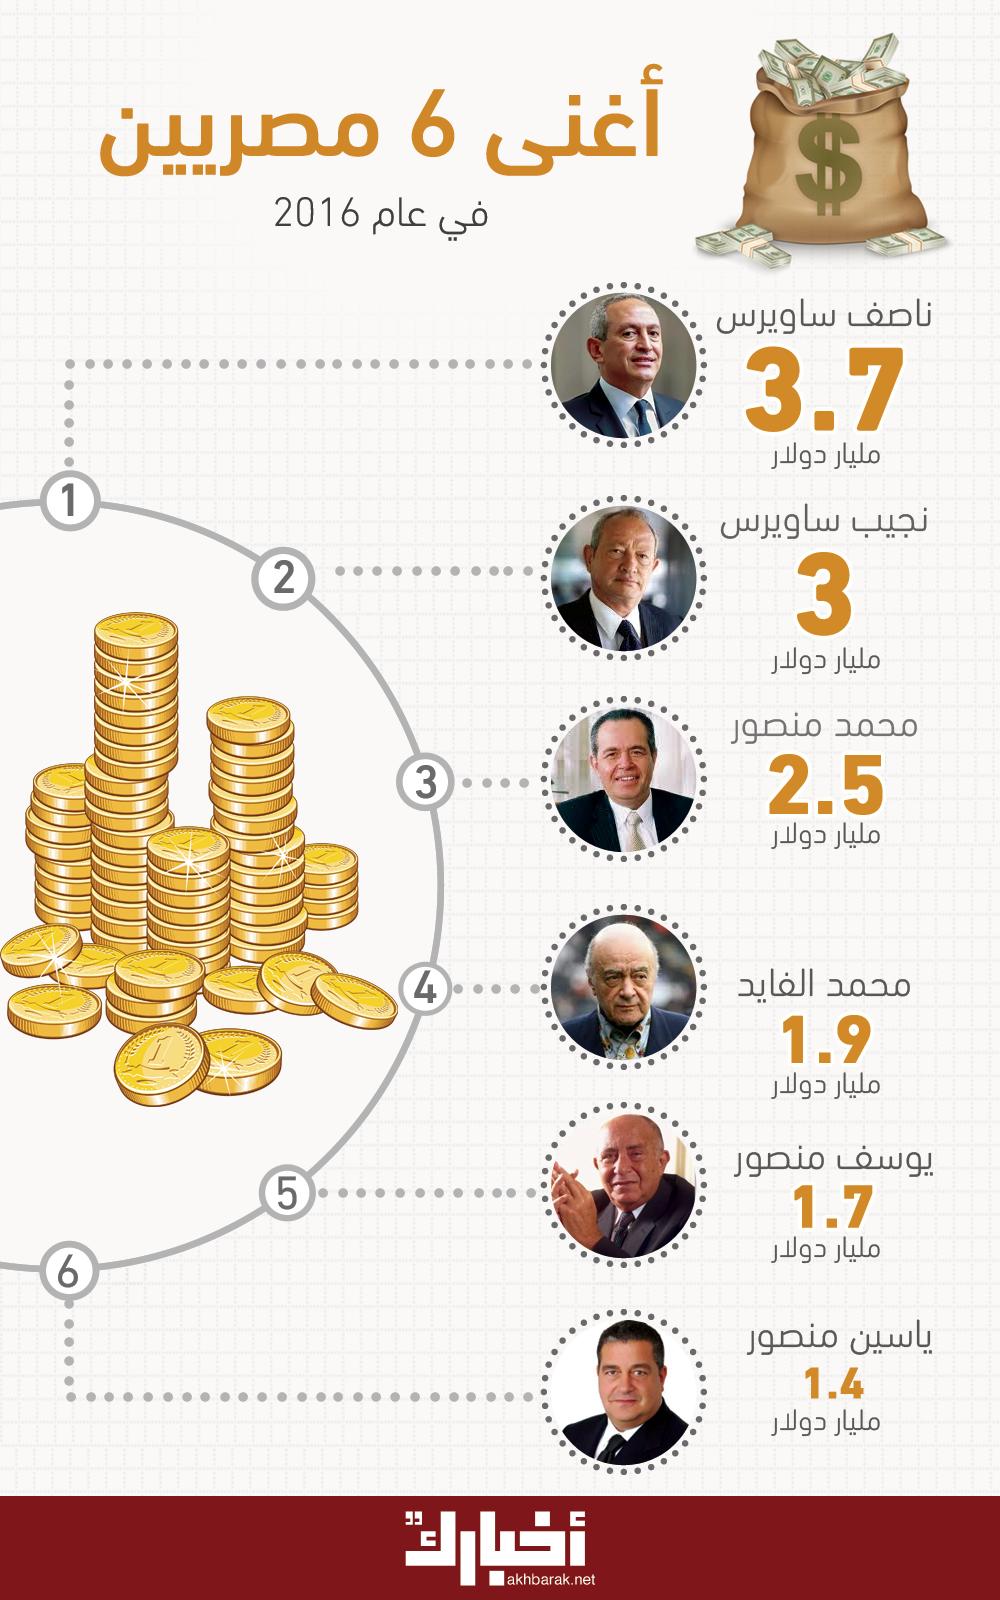 #حصاد_2016| أغنى 6 مصريين لعام 2016